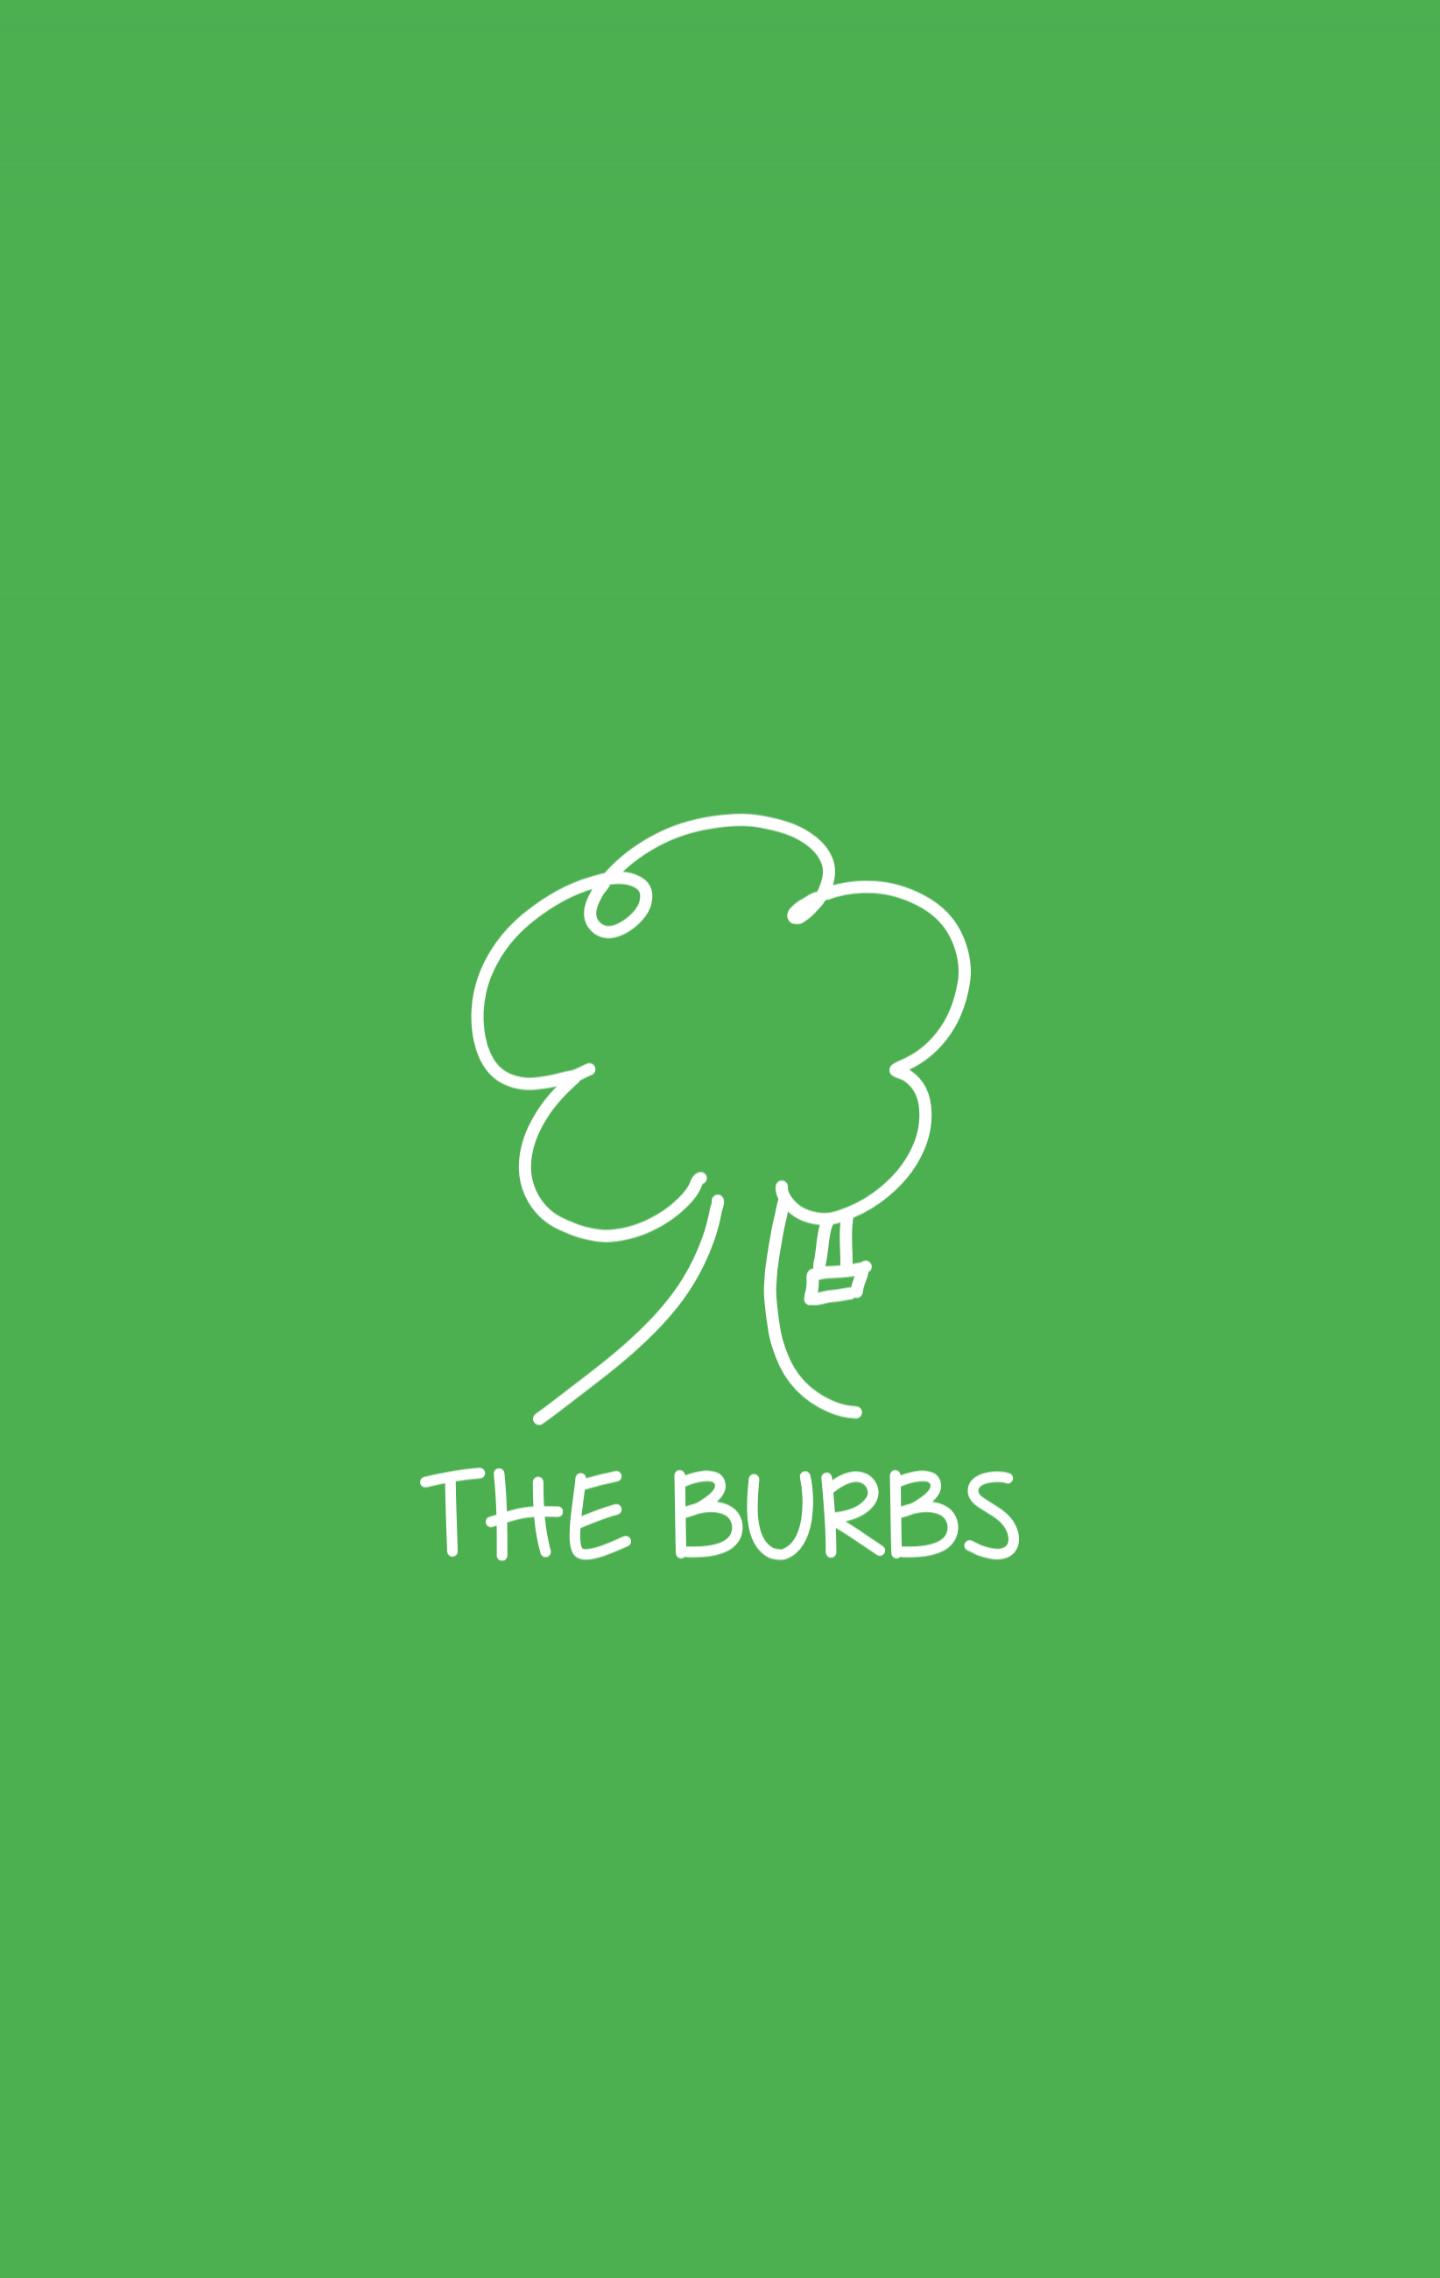 The Burbs app Load Screen